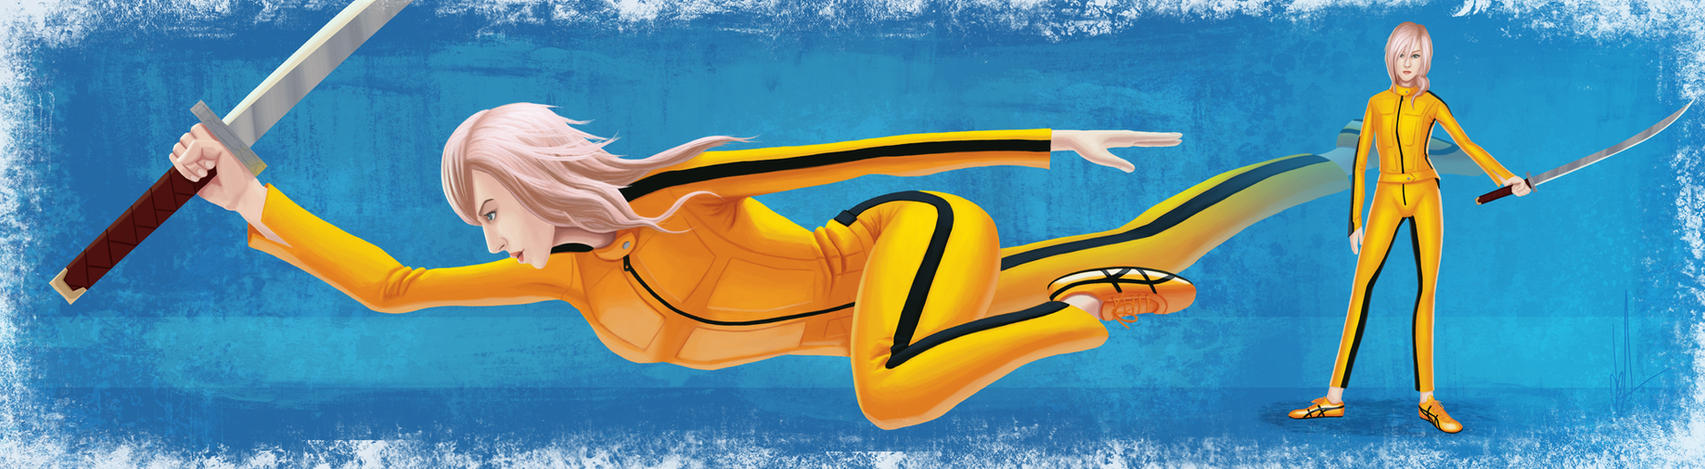 Yellow Lightning by renegade21